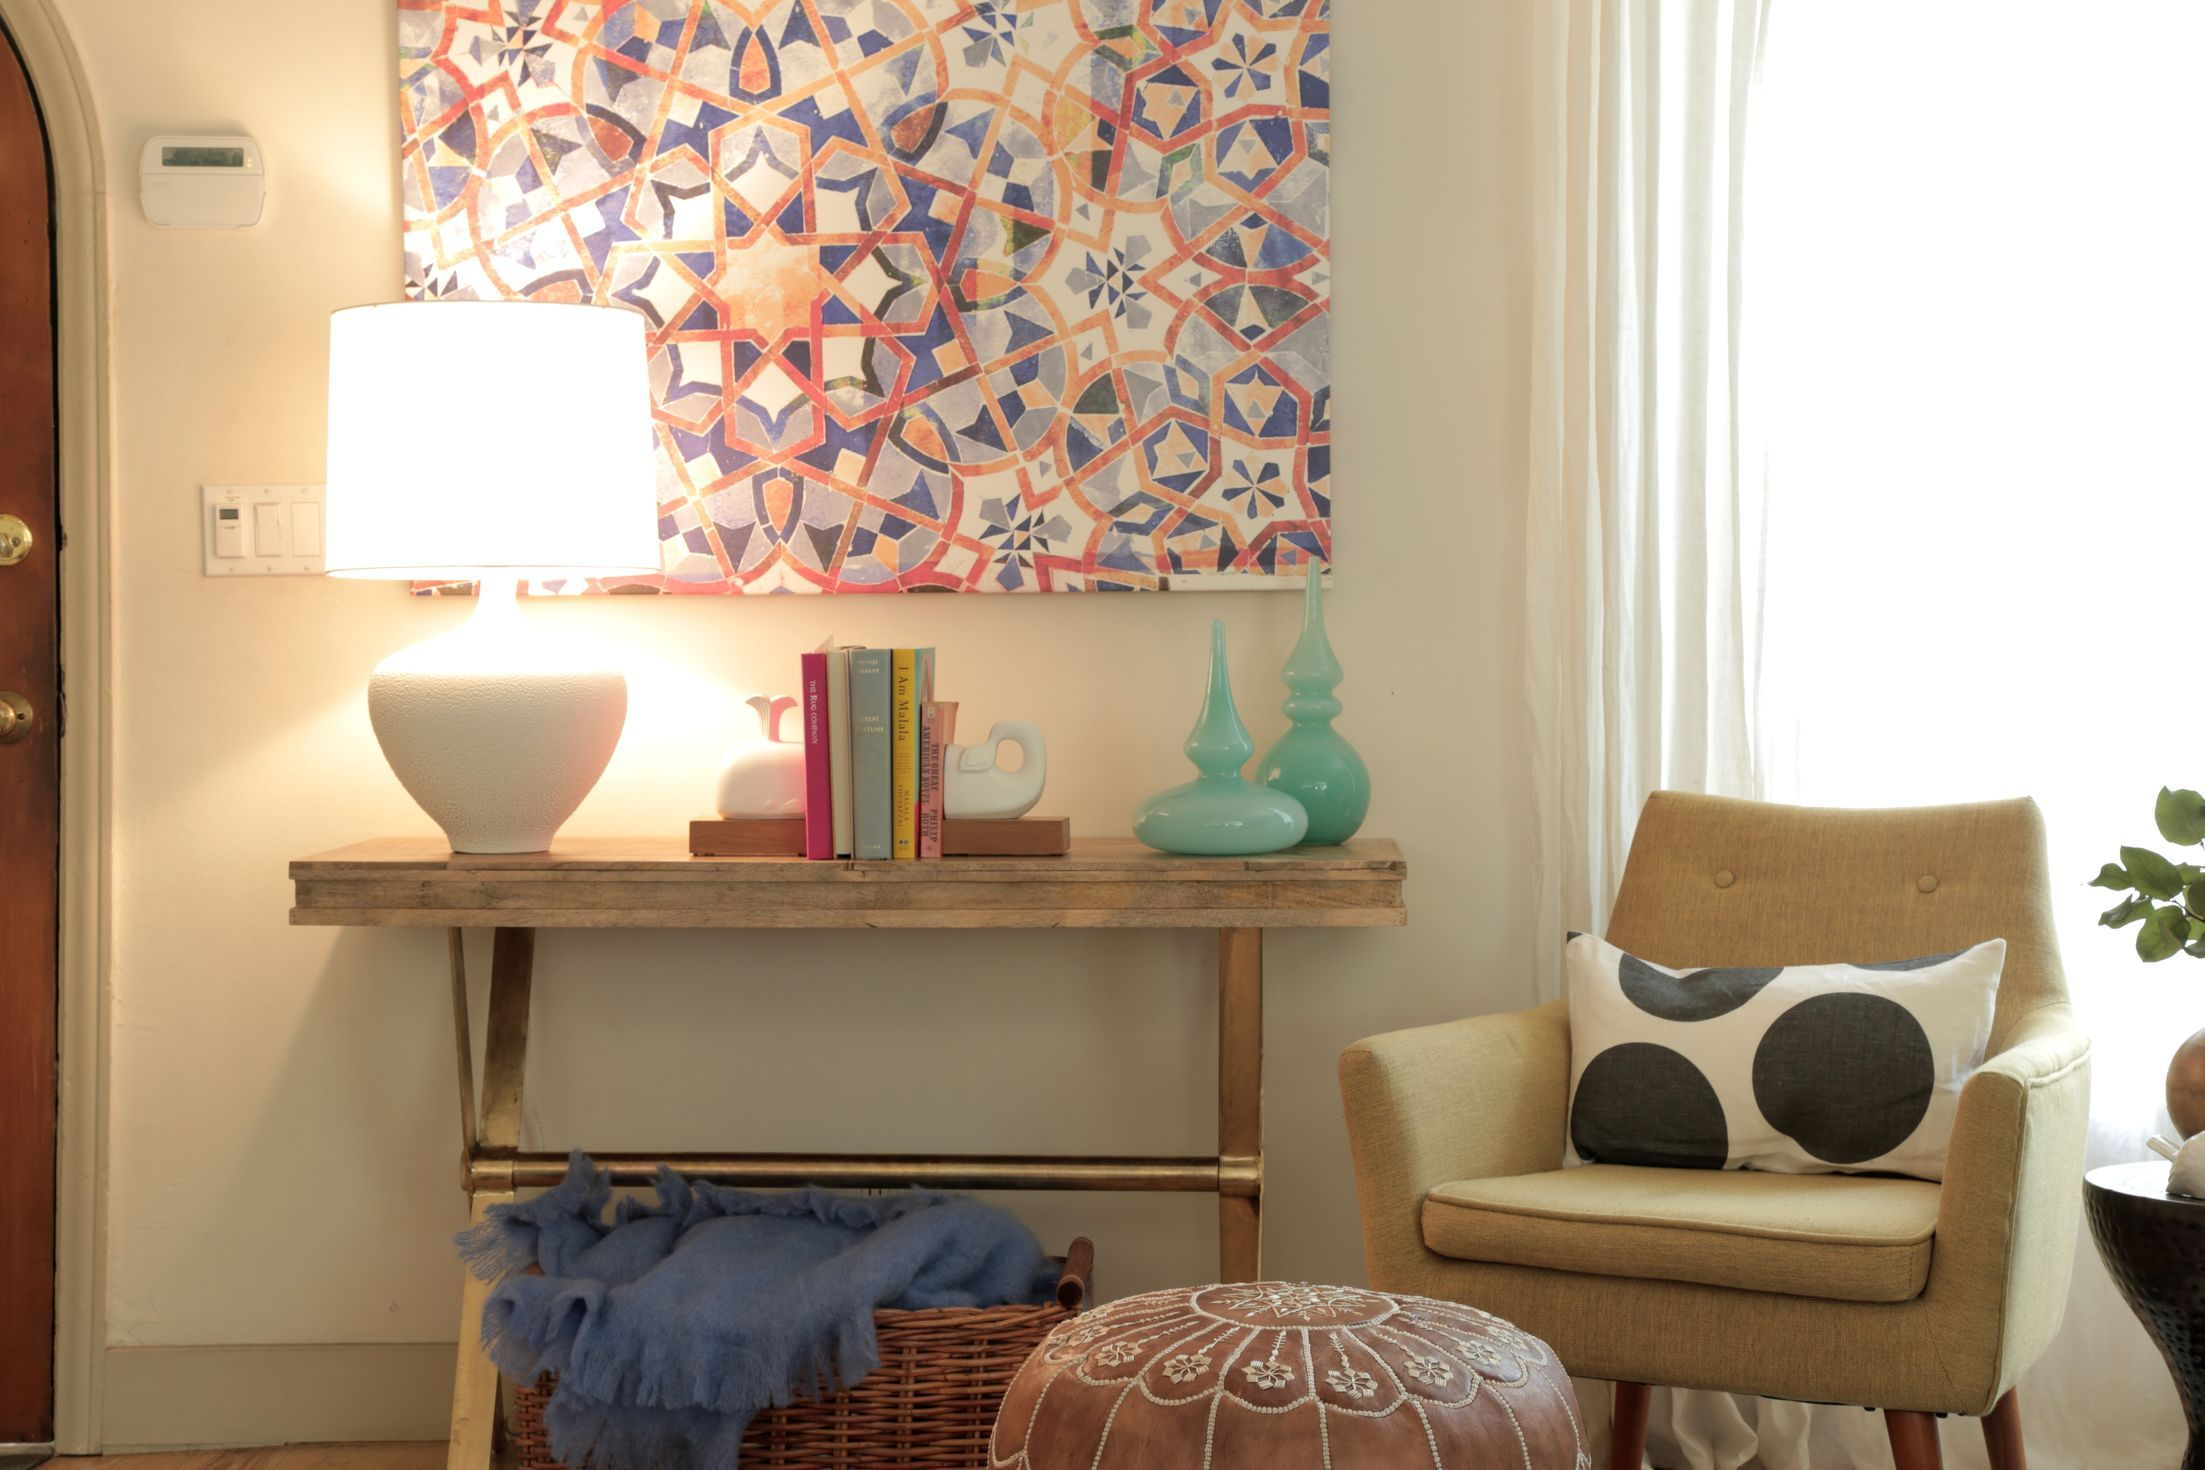 Home Decor On Pinterest 1503 Pins